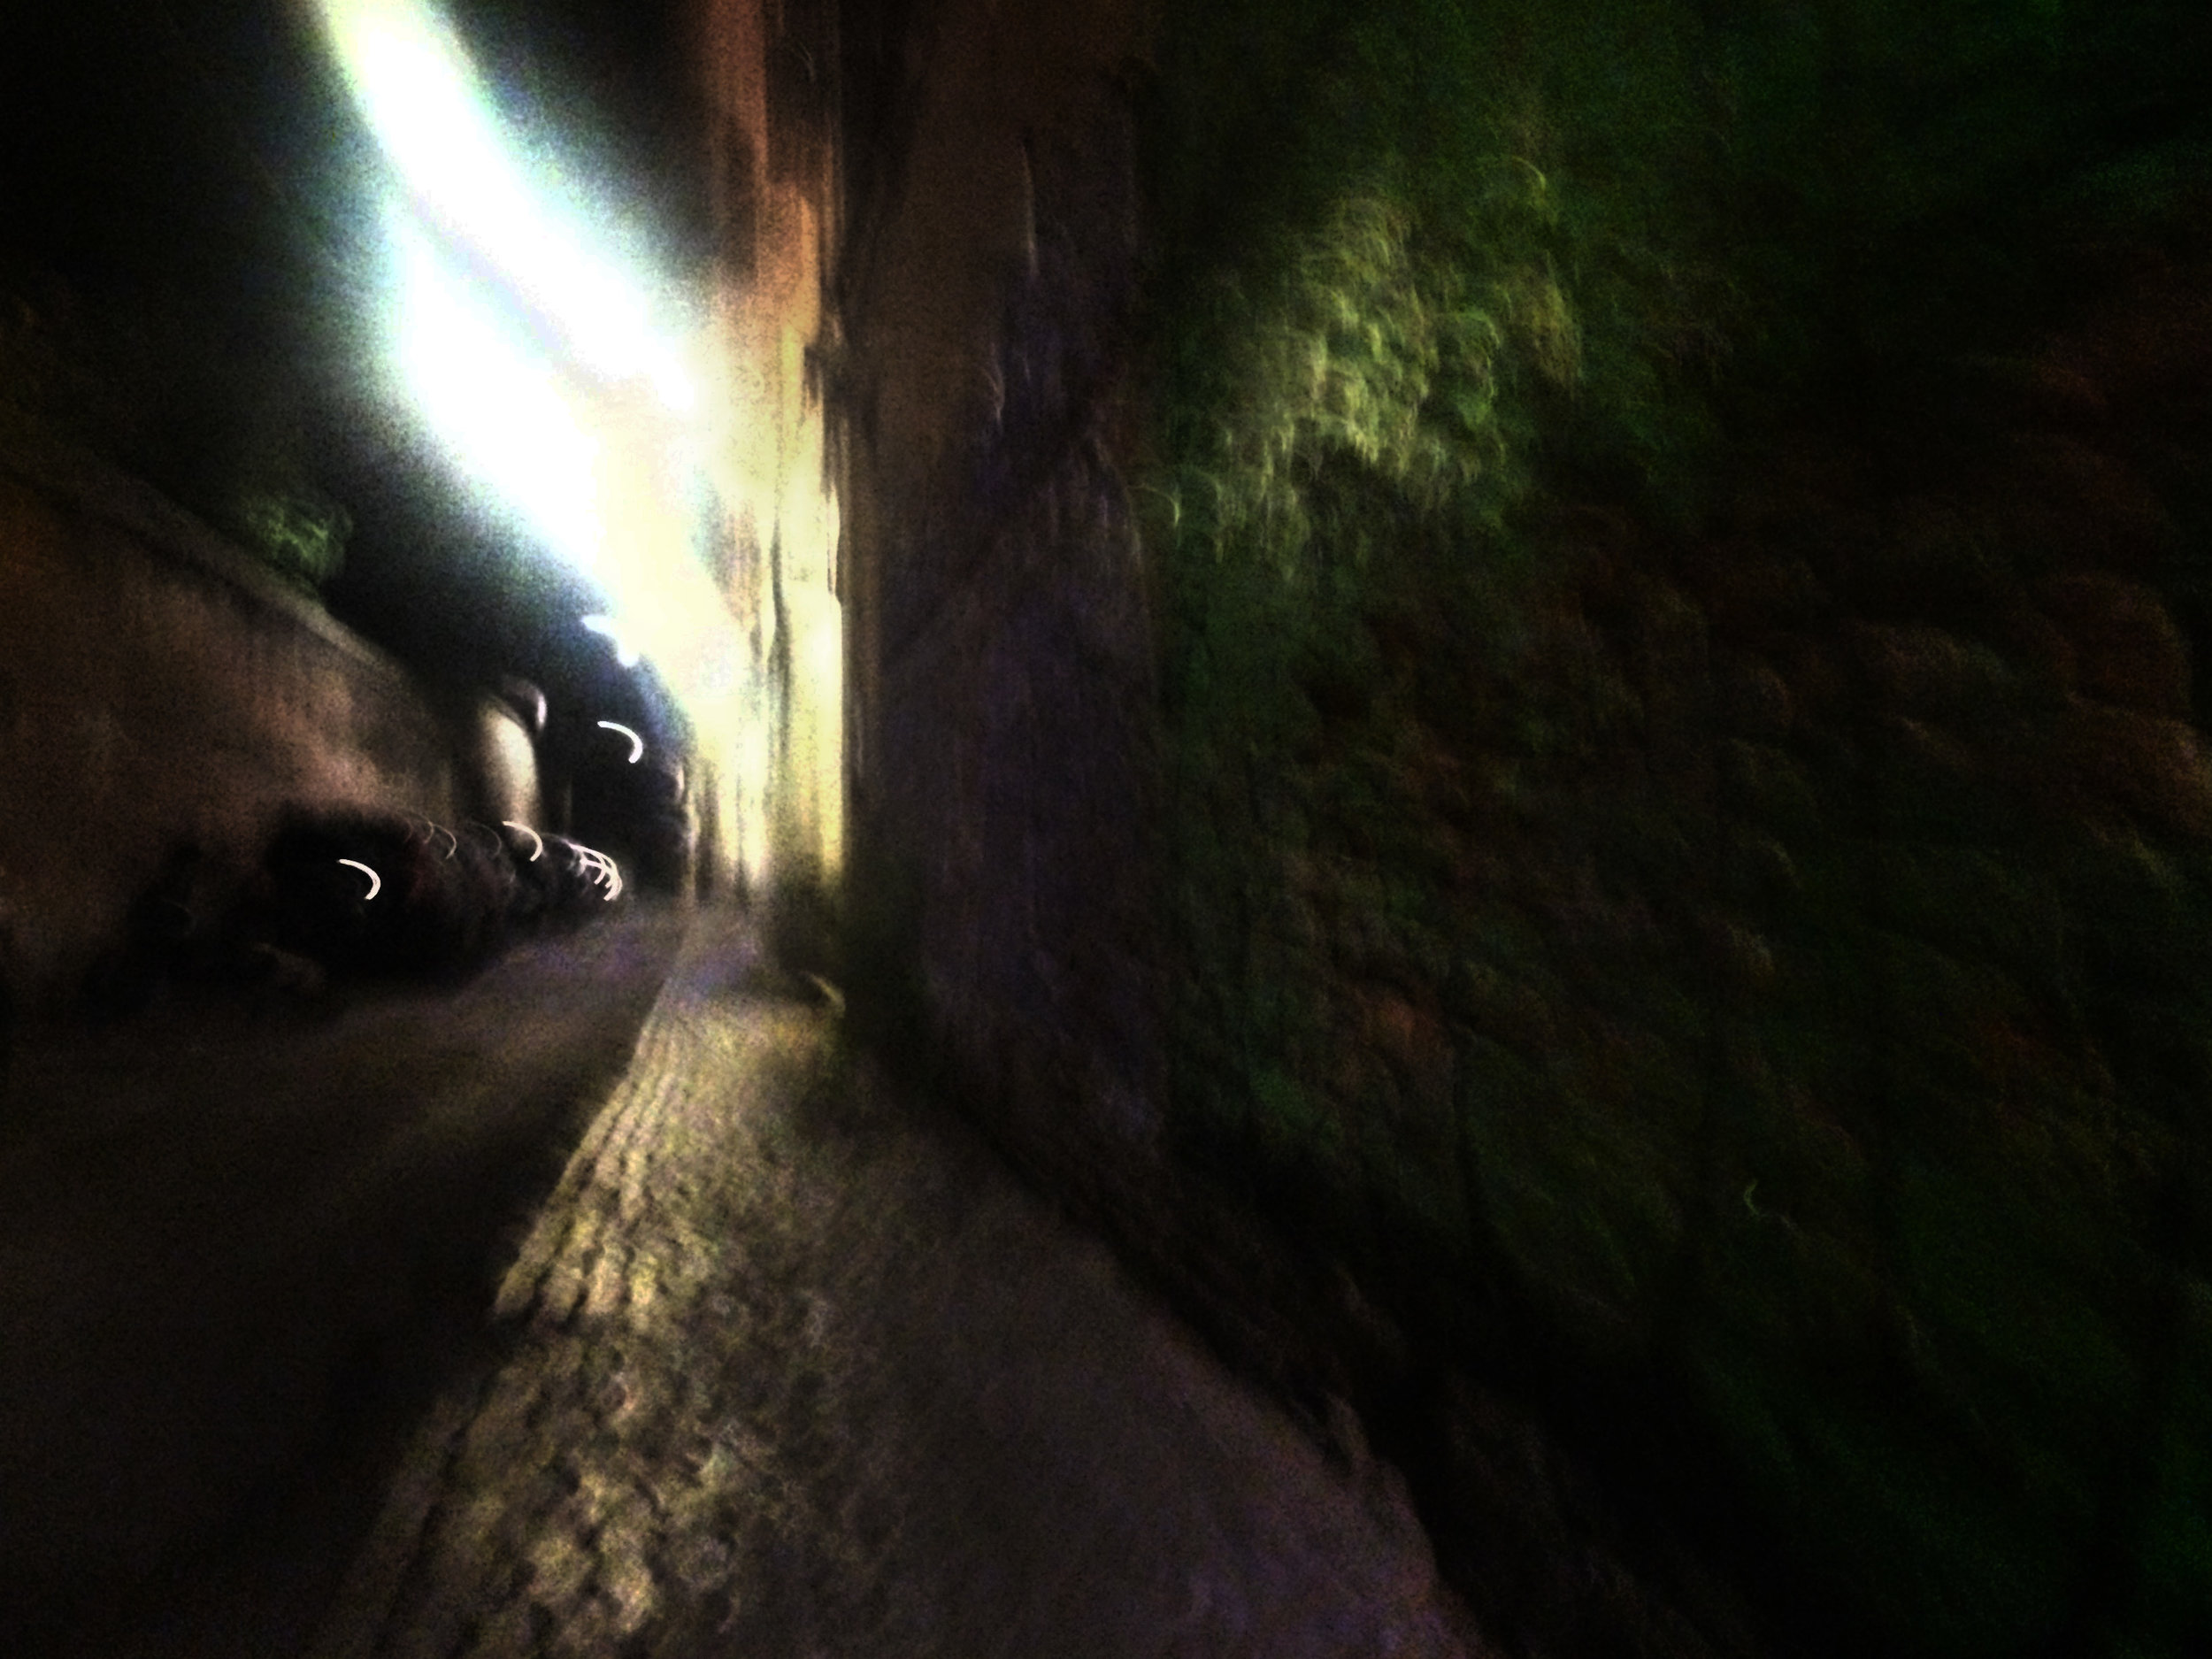 Walking at Night_A un attento esame il muschio si rivela pittura.jpg